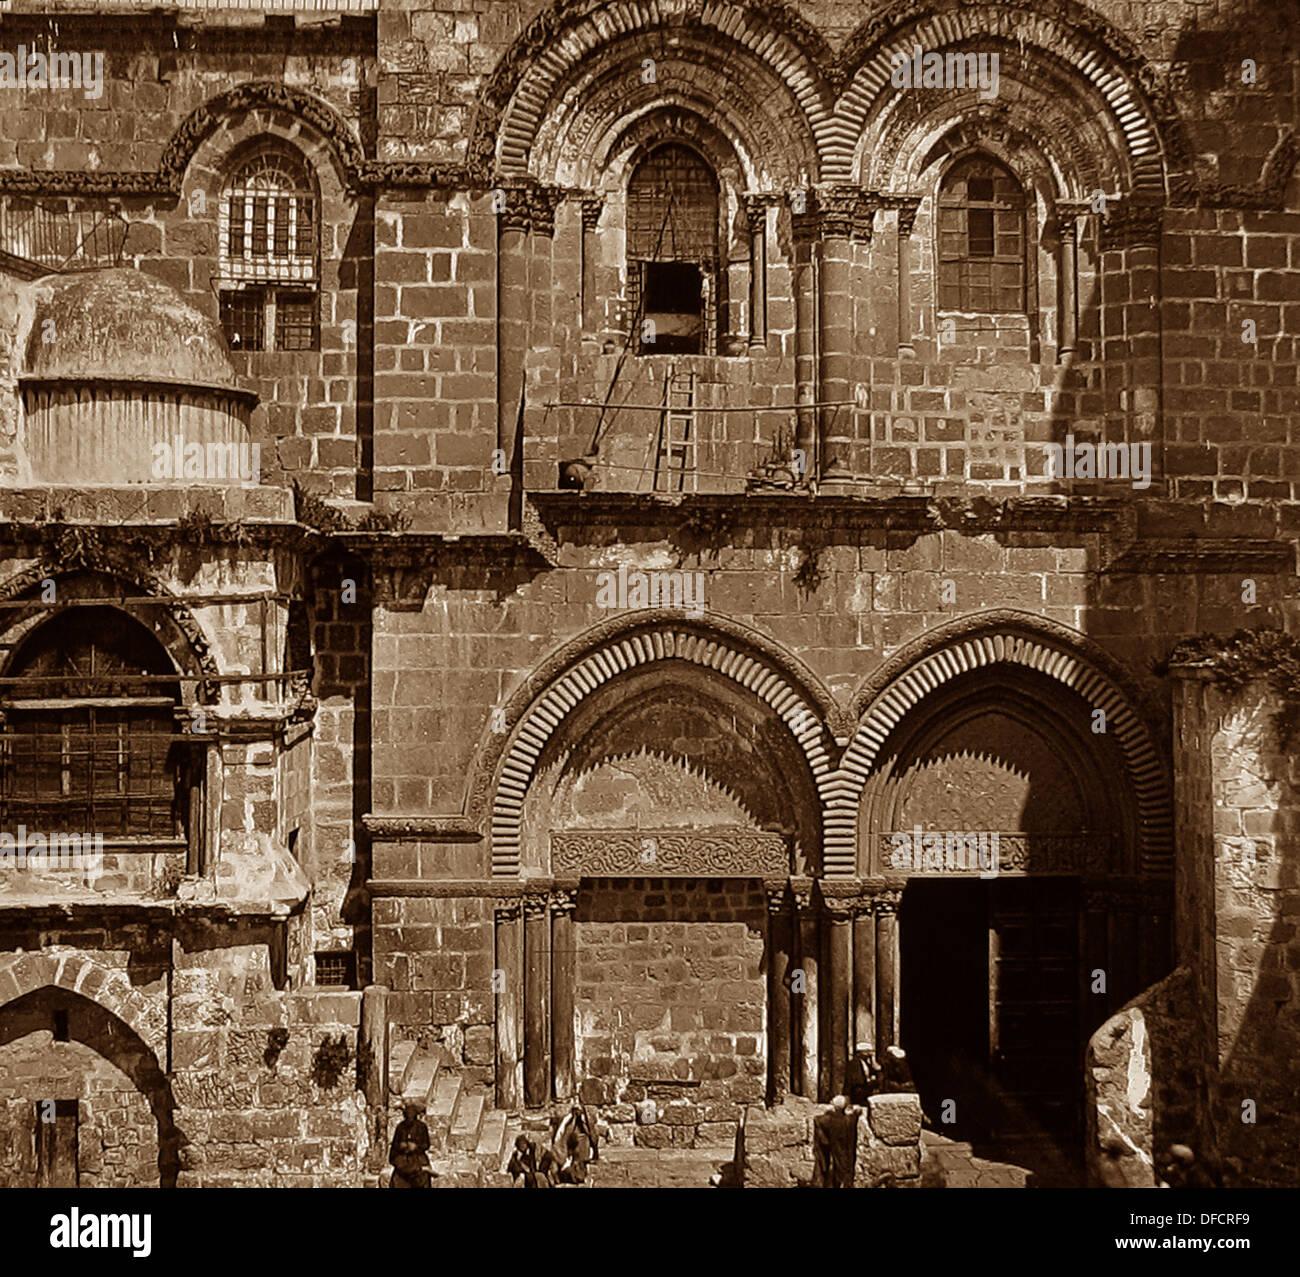 Jerusalem Church of the Holy Sepulchre probably 1870s - Stock Image